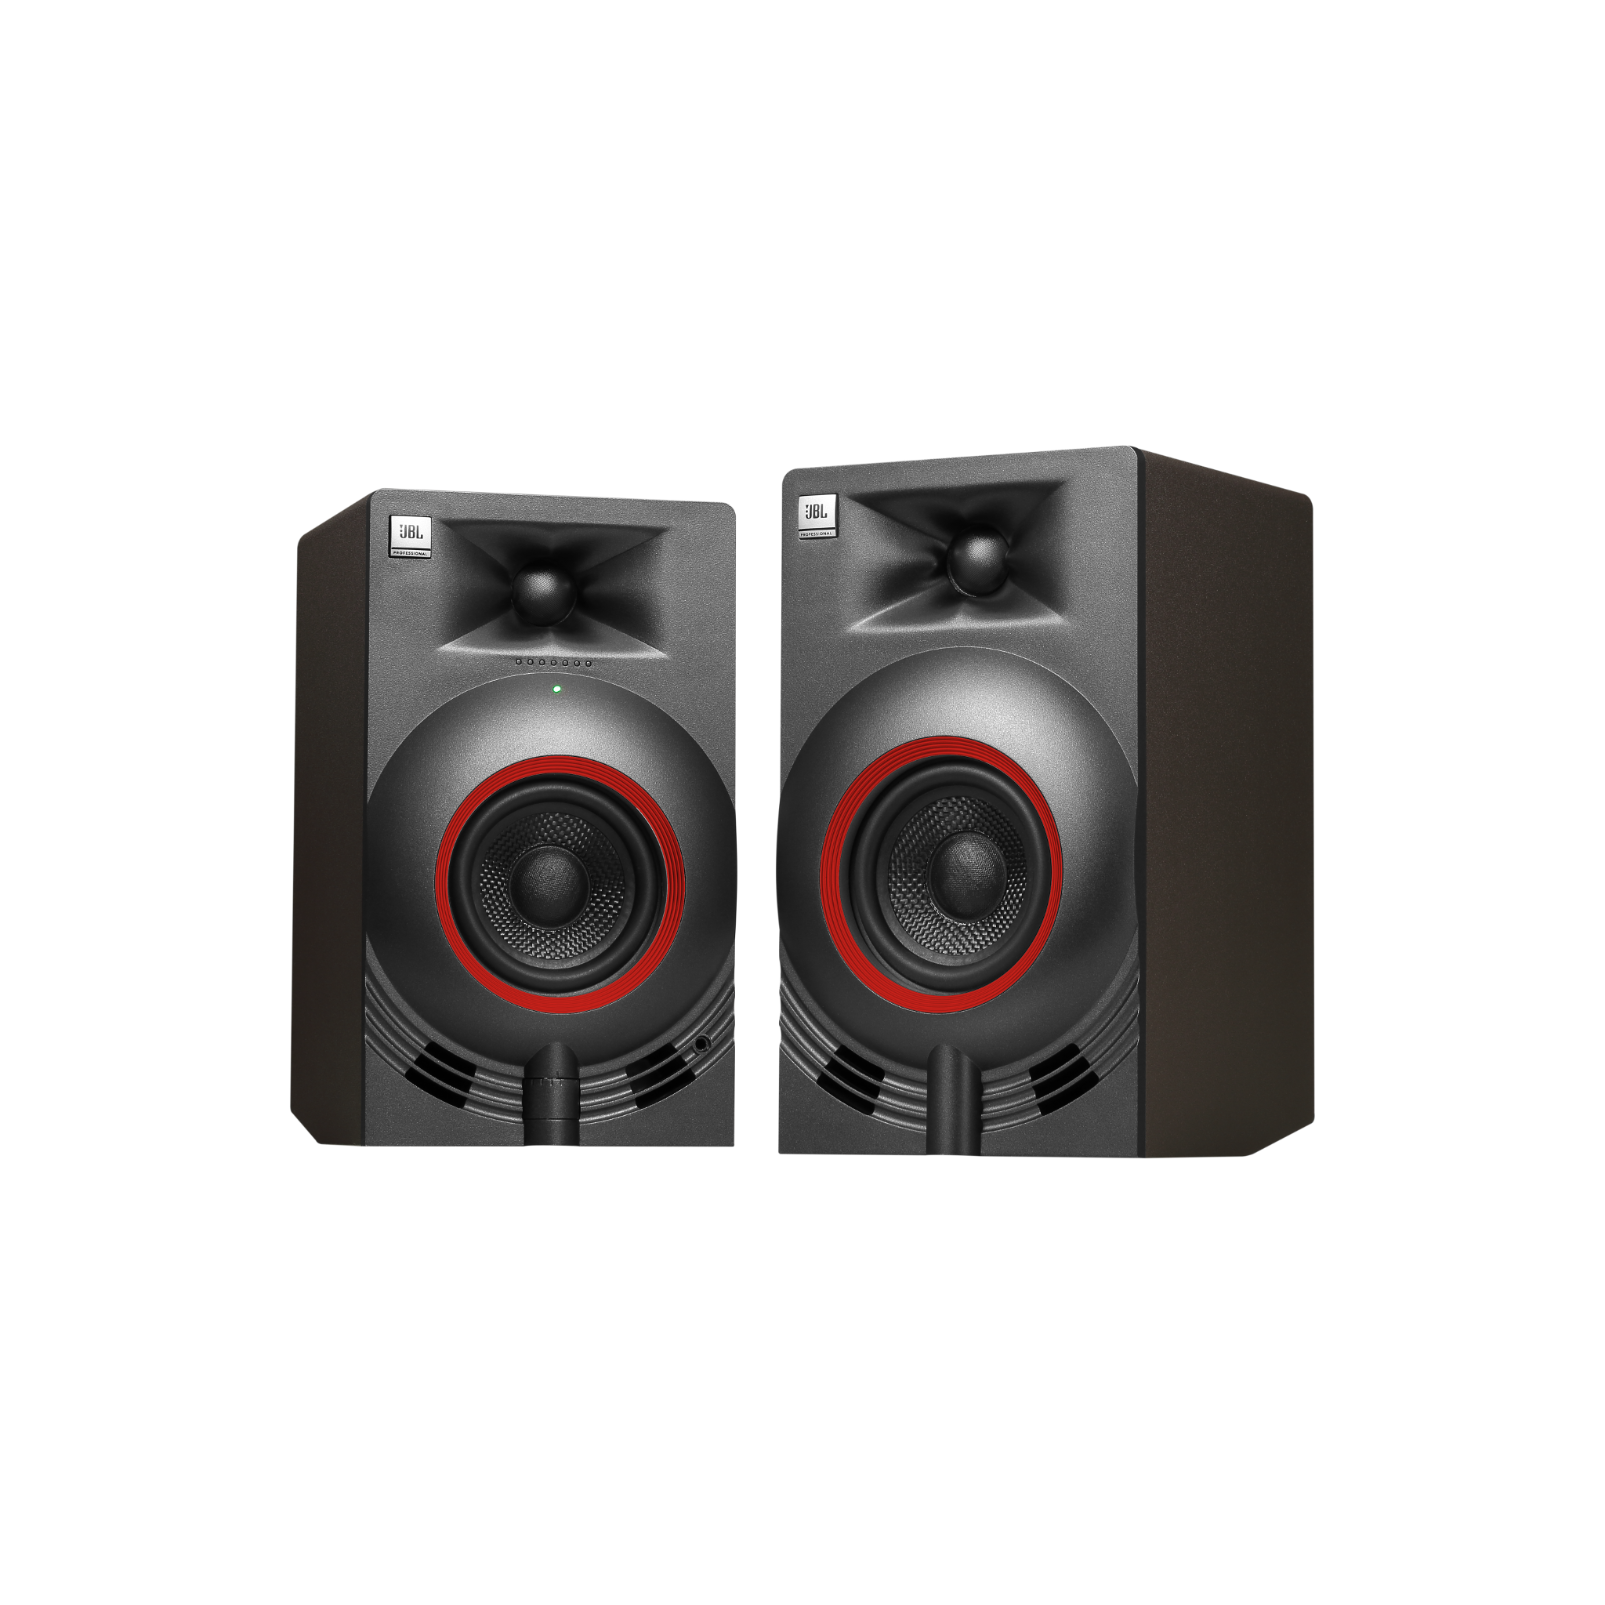 "NANO K3 - Black - 3"" (7.62 cm) Full-range Powered Monitor Pair - Hero"